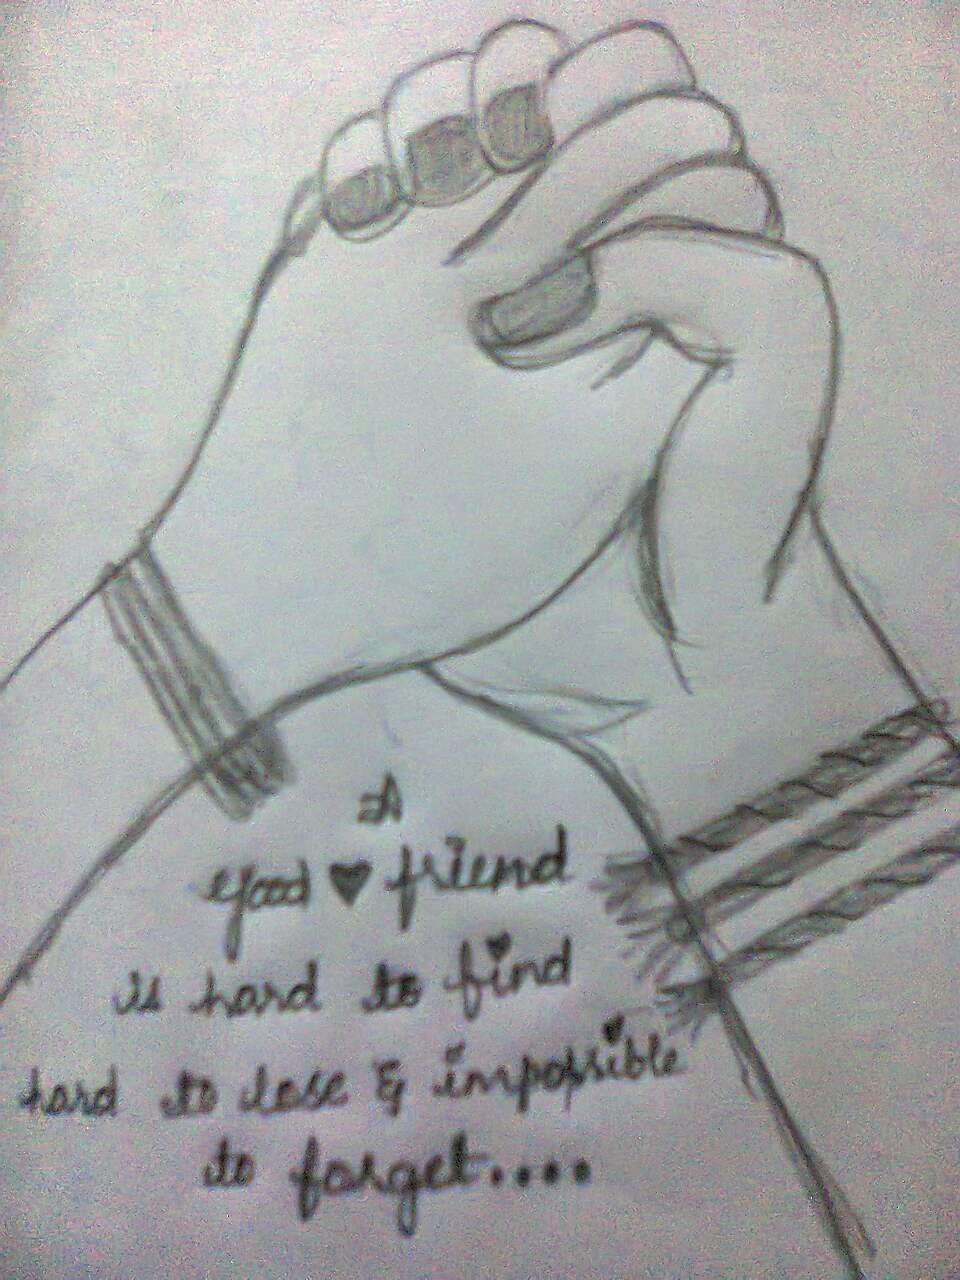 Easy Pencil Drawings Of Friendship - pencildrawing2019